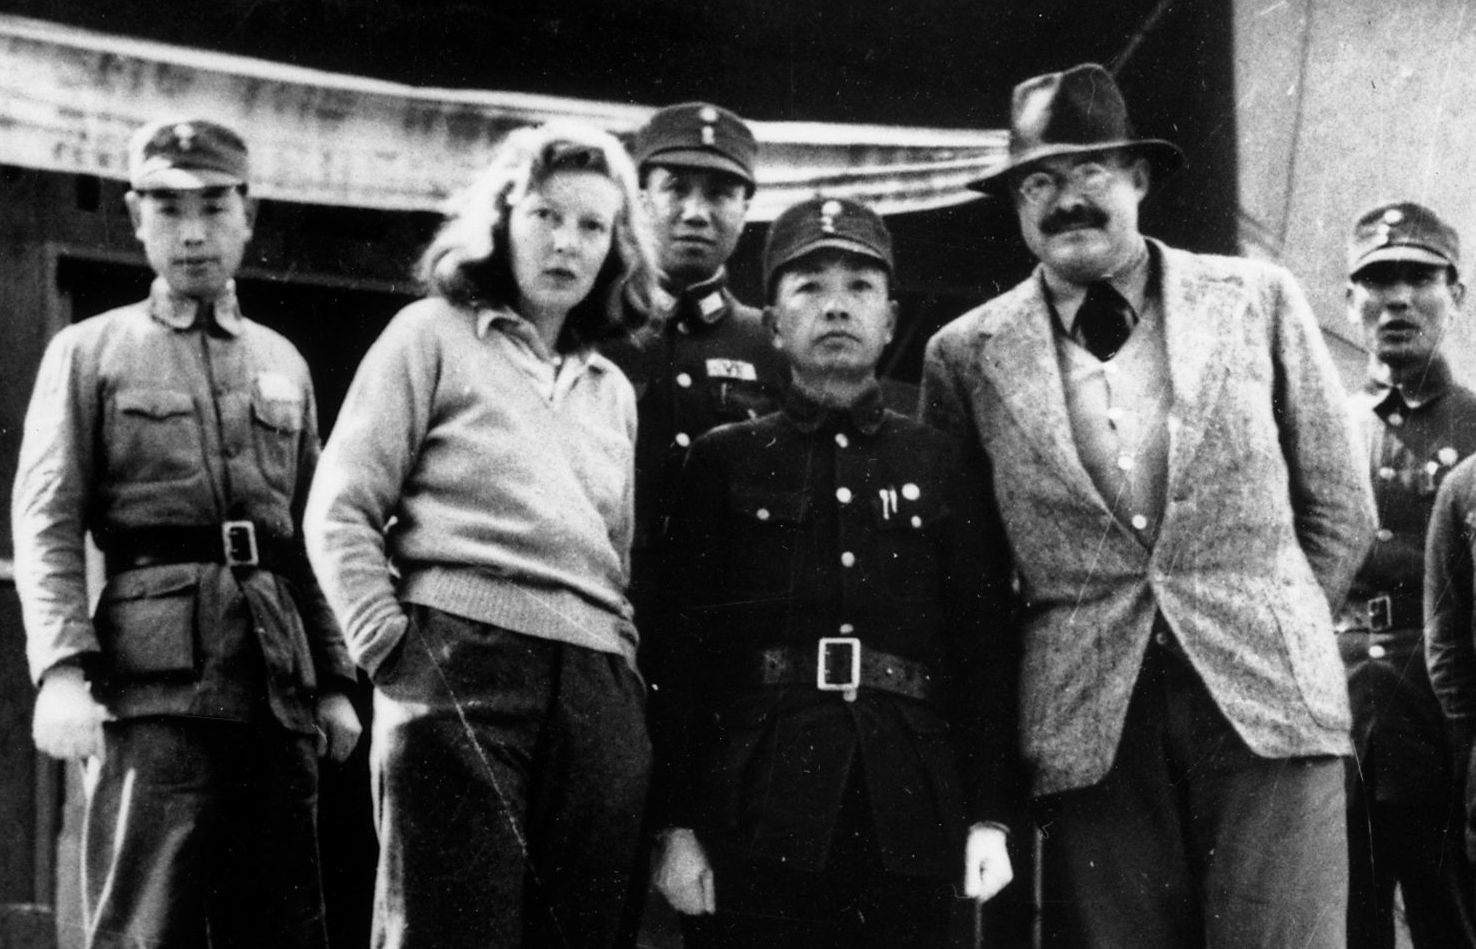 Ernest Hemingway y Martha Gellhorn, durante su visita a China en 1941